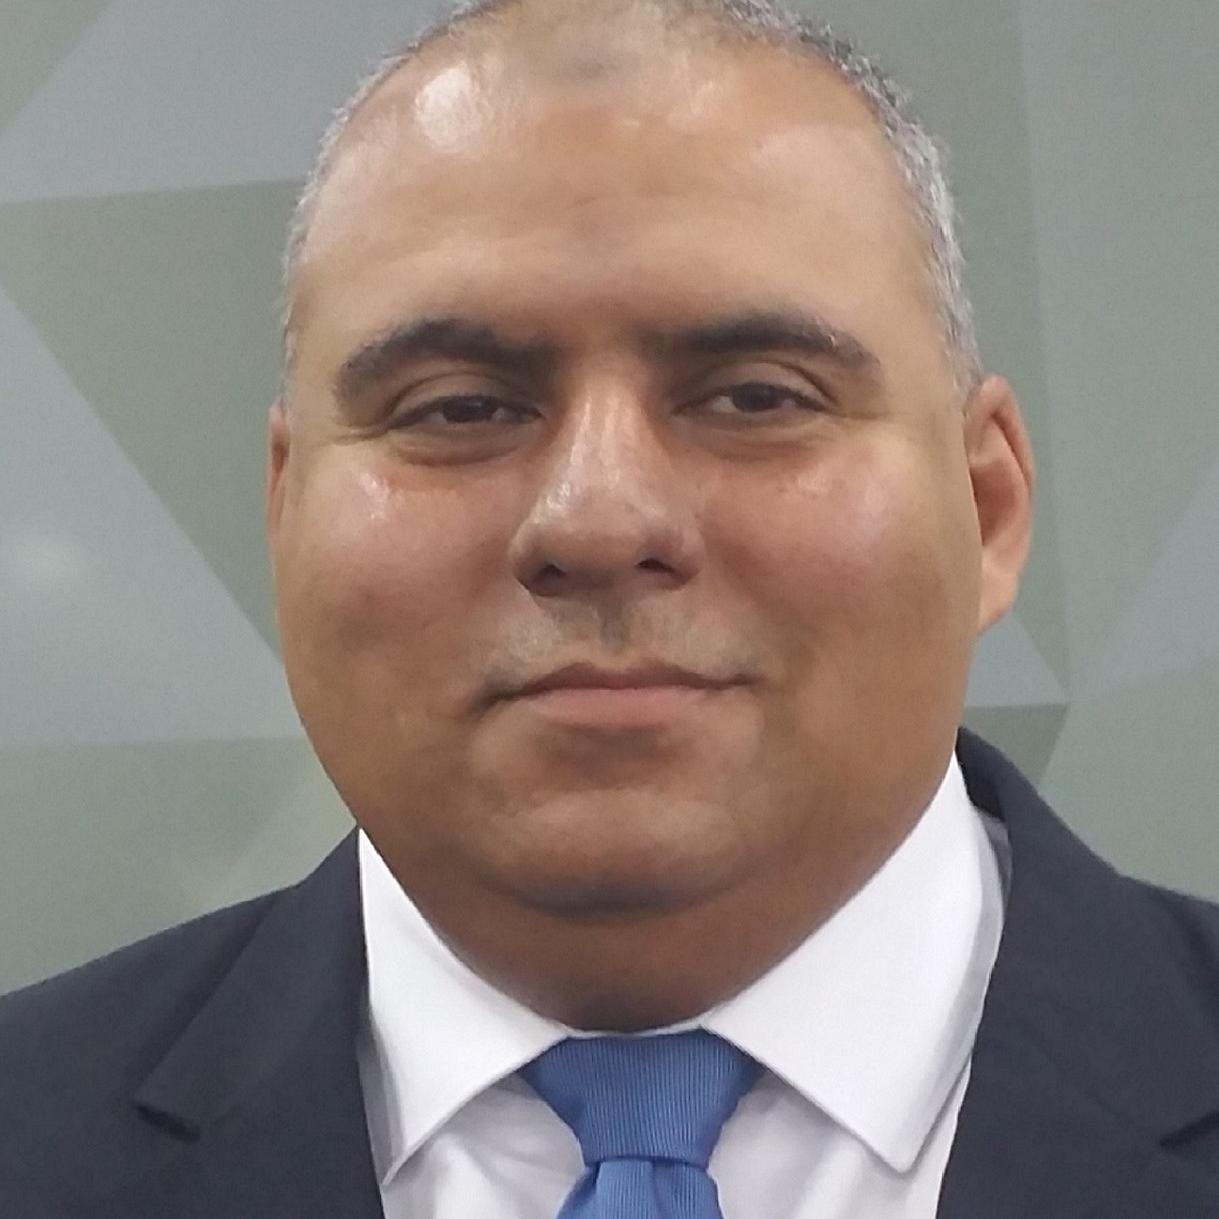 Dr. Khaled Abdel - Motagaly